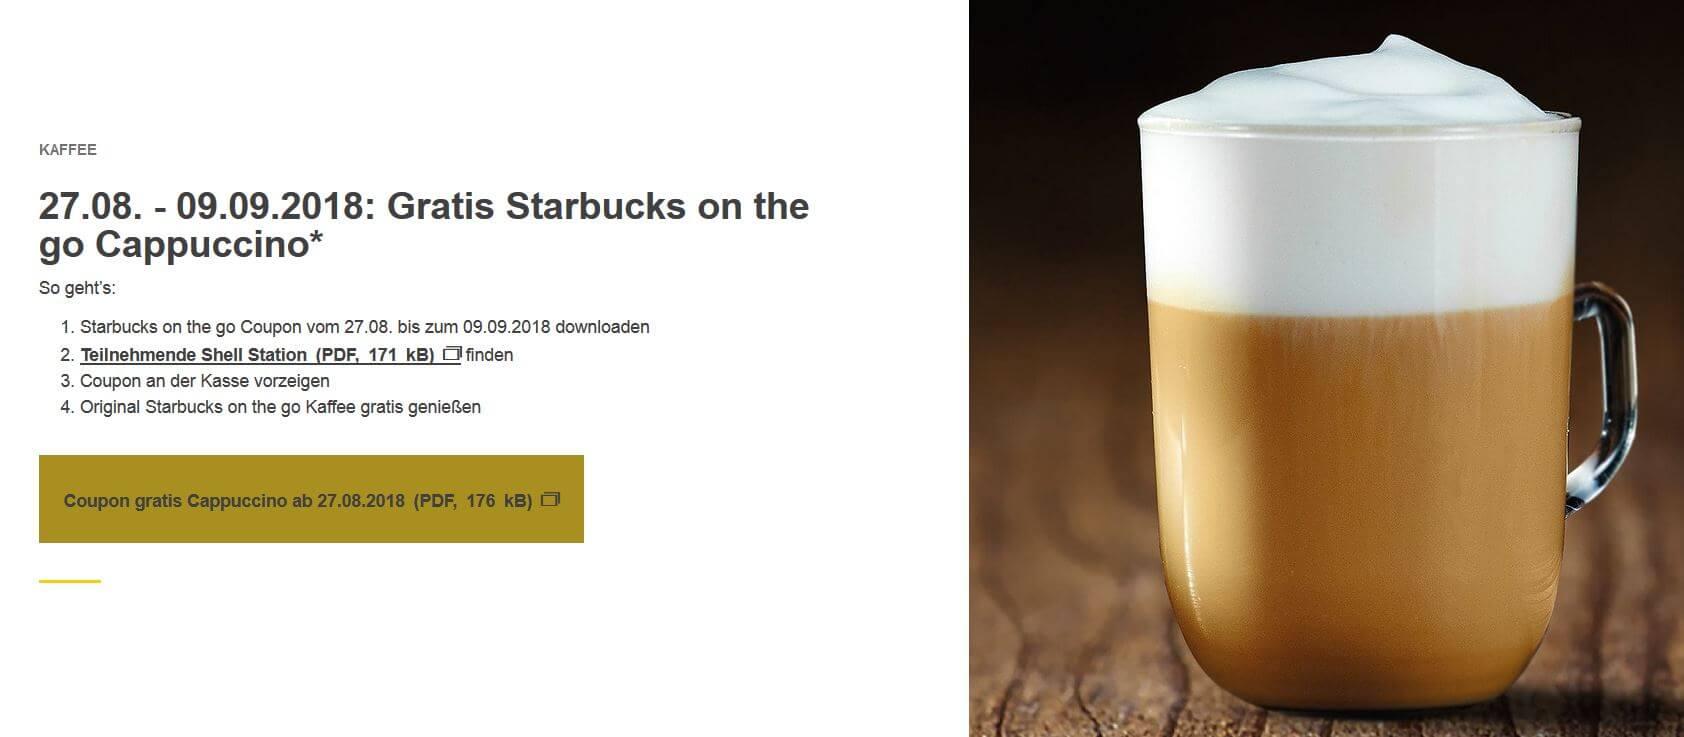 SHELL Starbucks Cappuccino to Go gratis